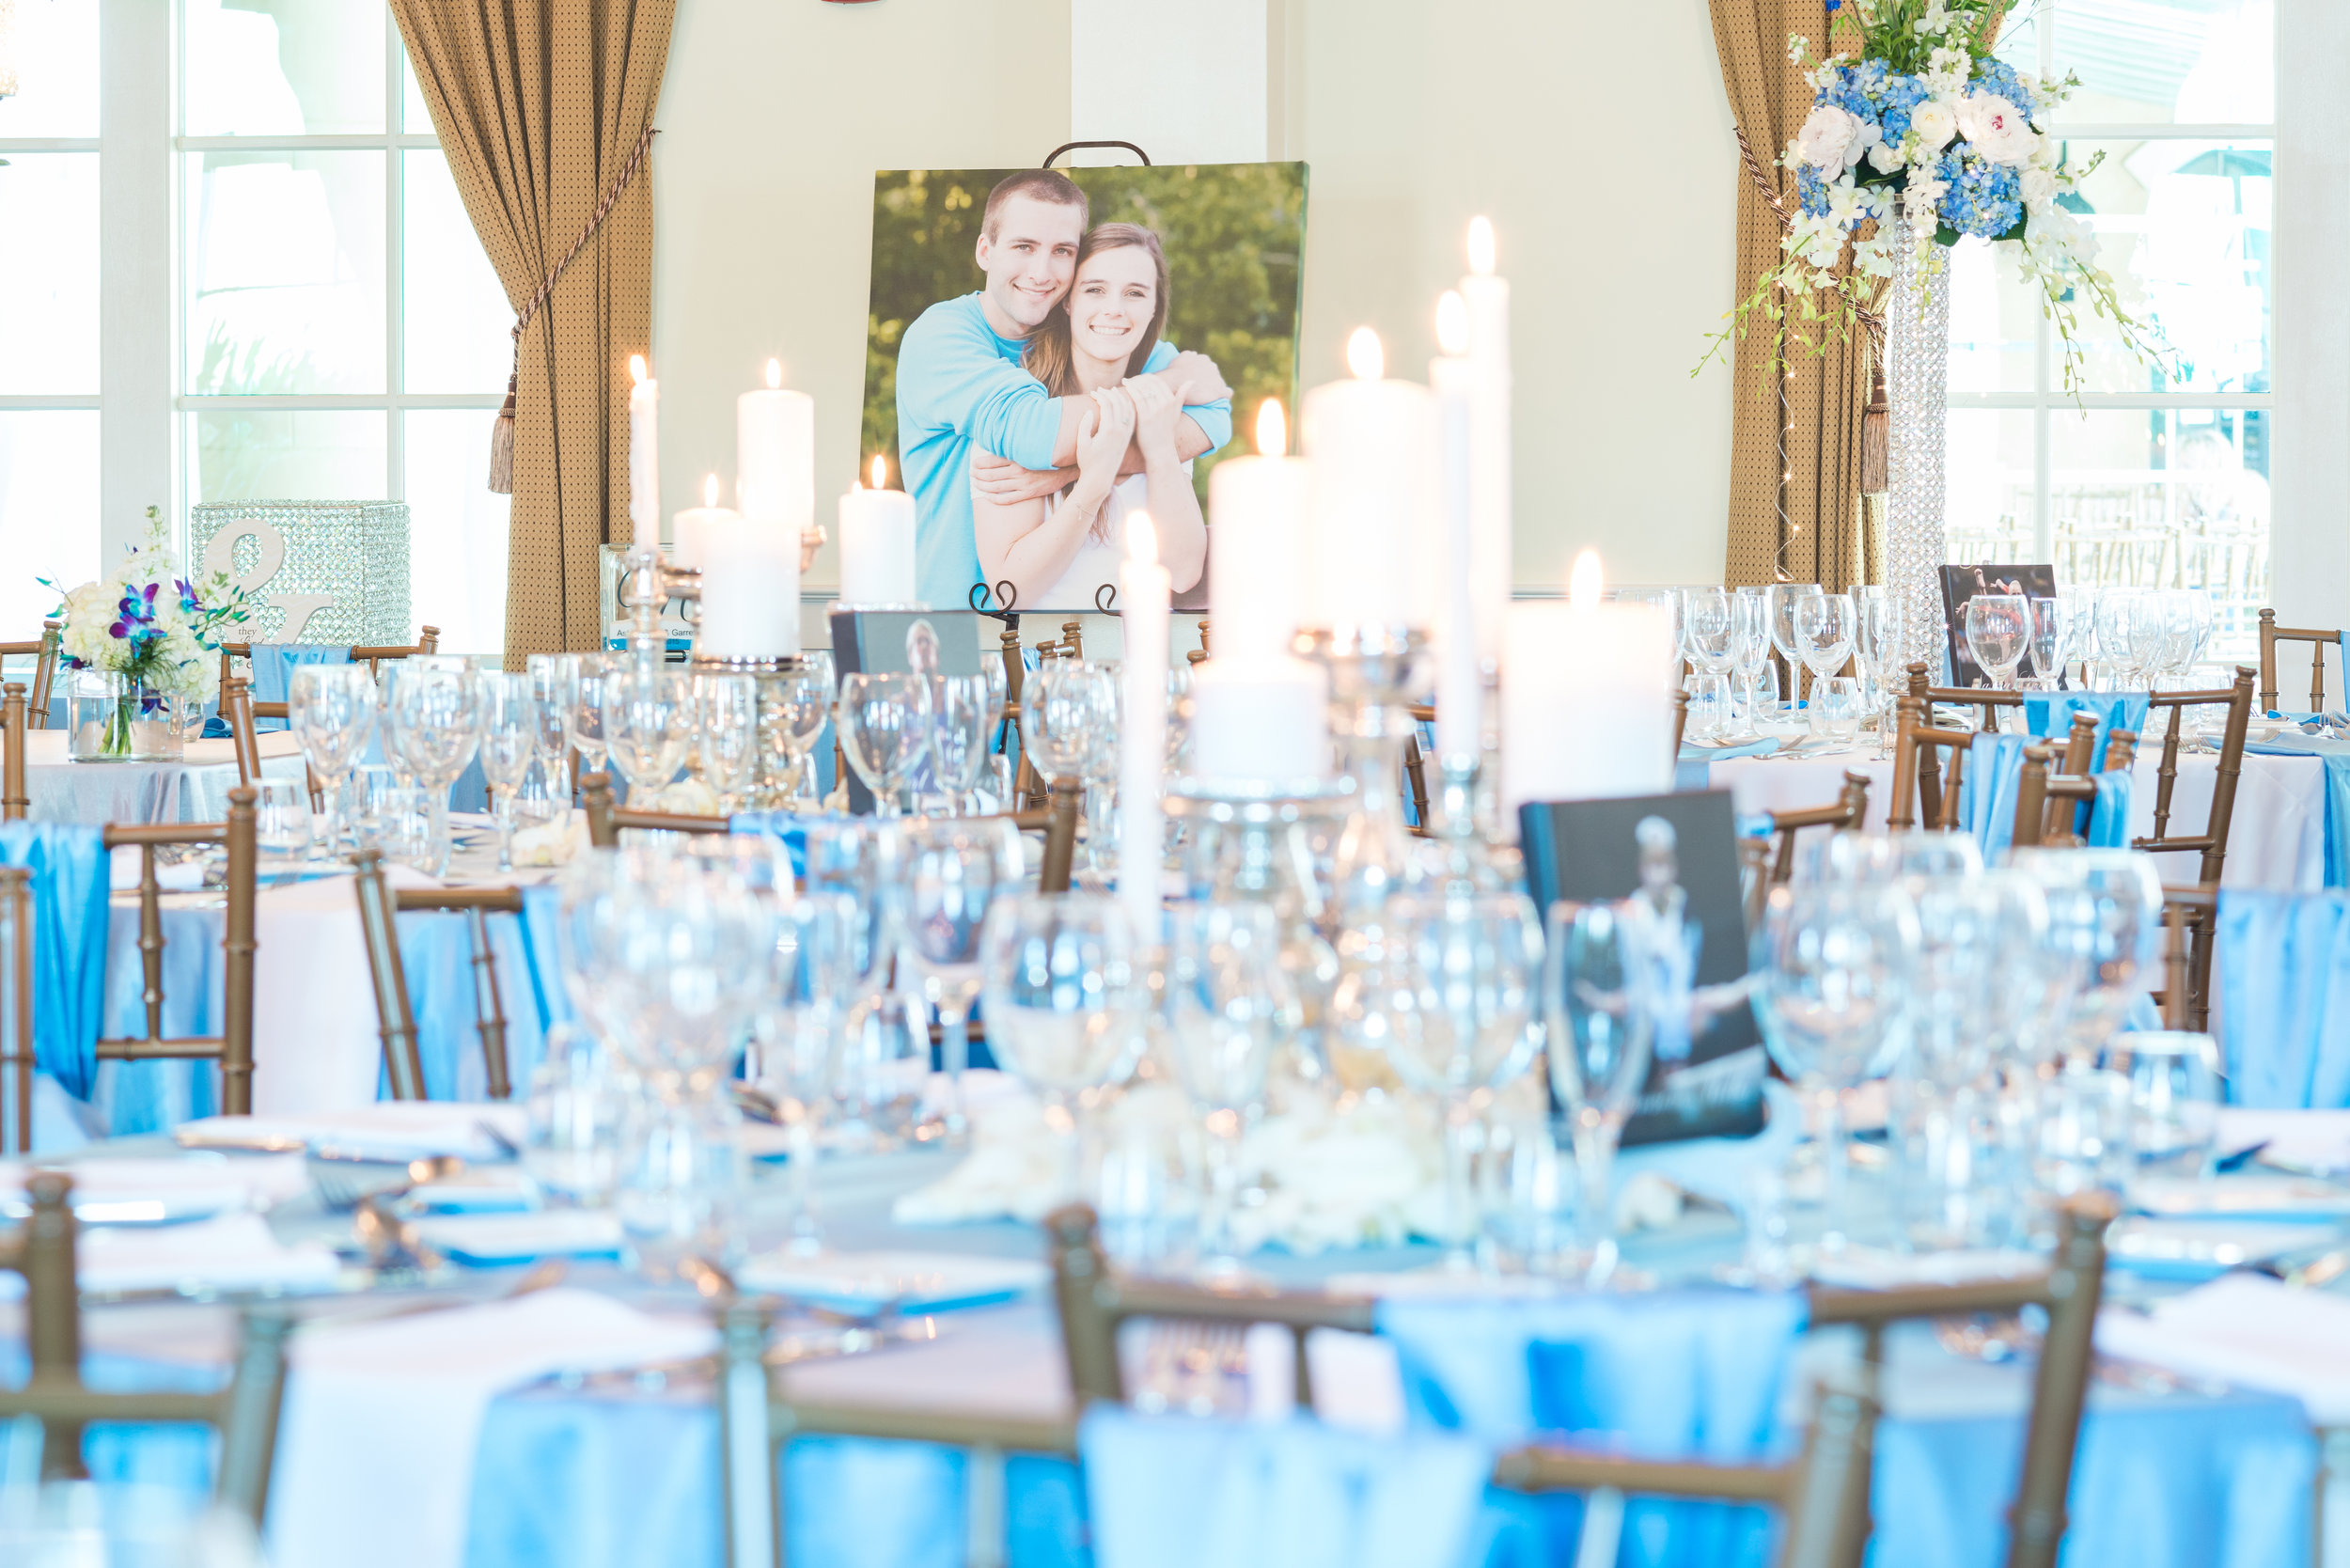 Carl-Kerridge-Photography-North-Beach-Wedding-May-2015-017.jpg